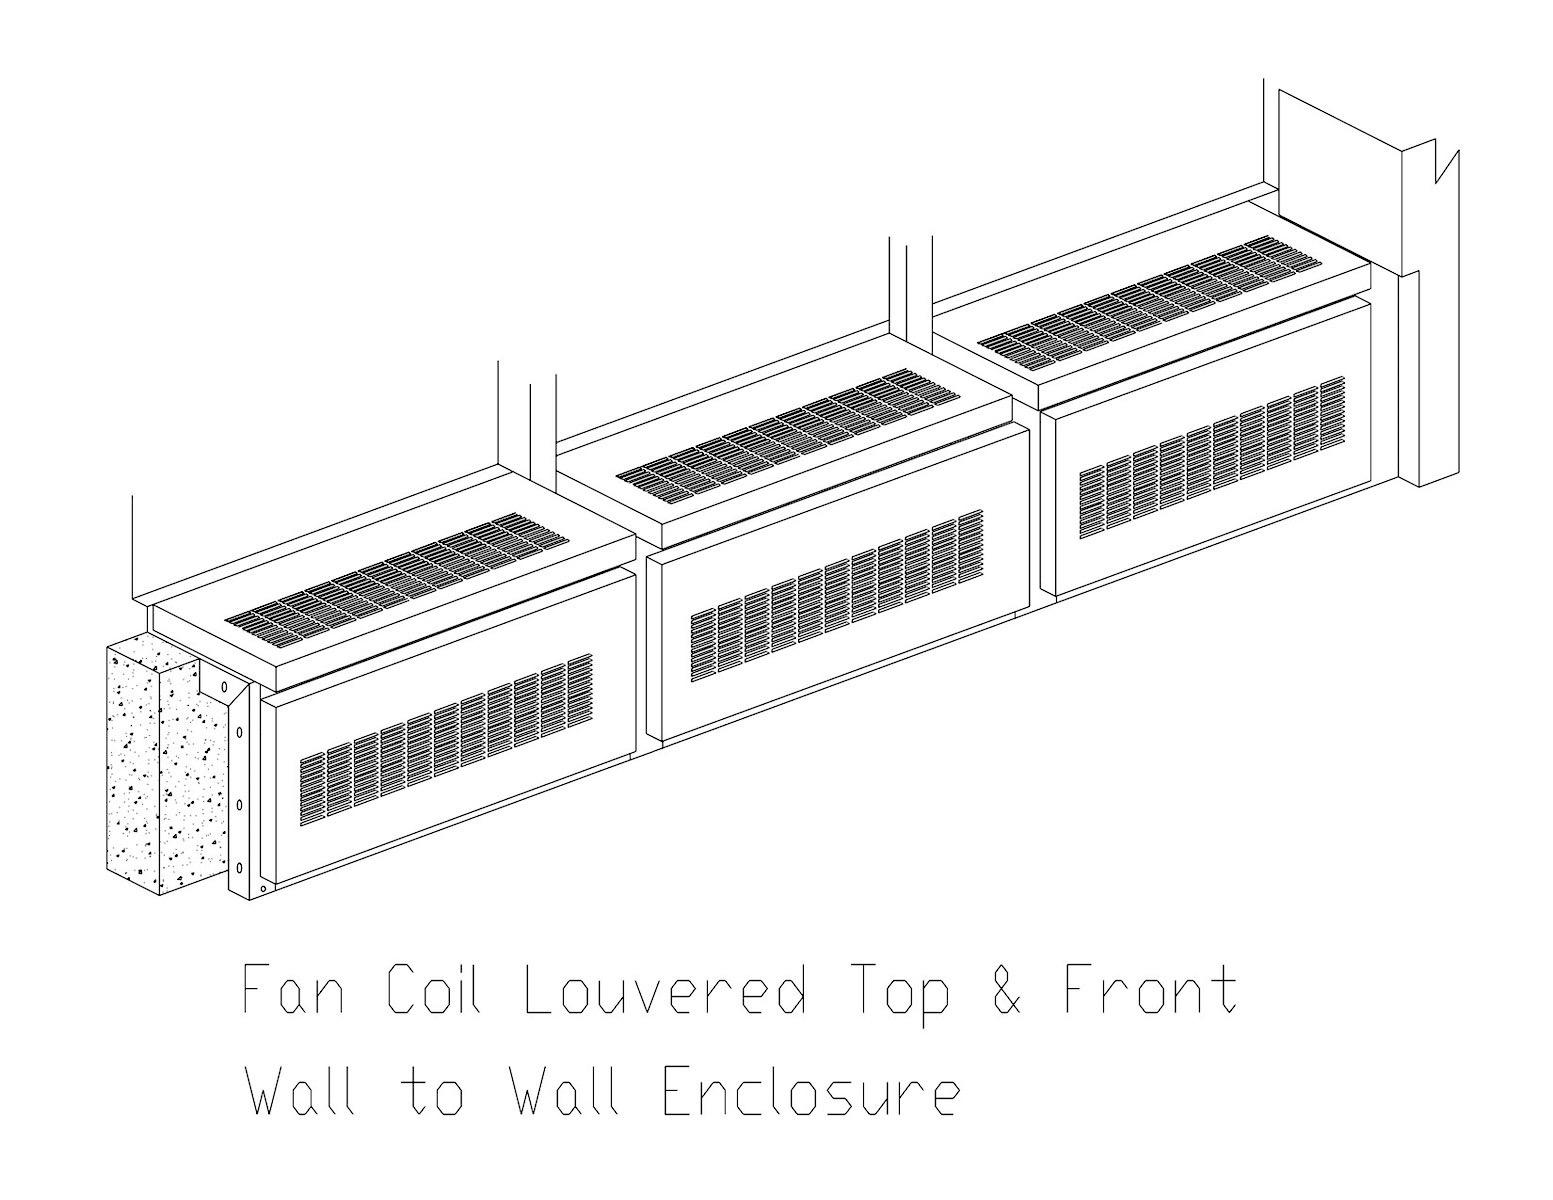 9Fan Coil Encl.